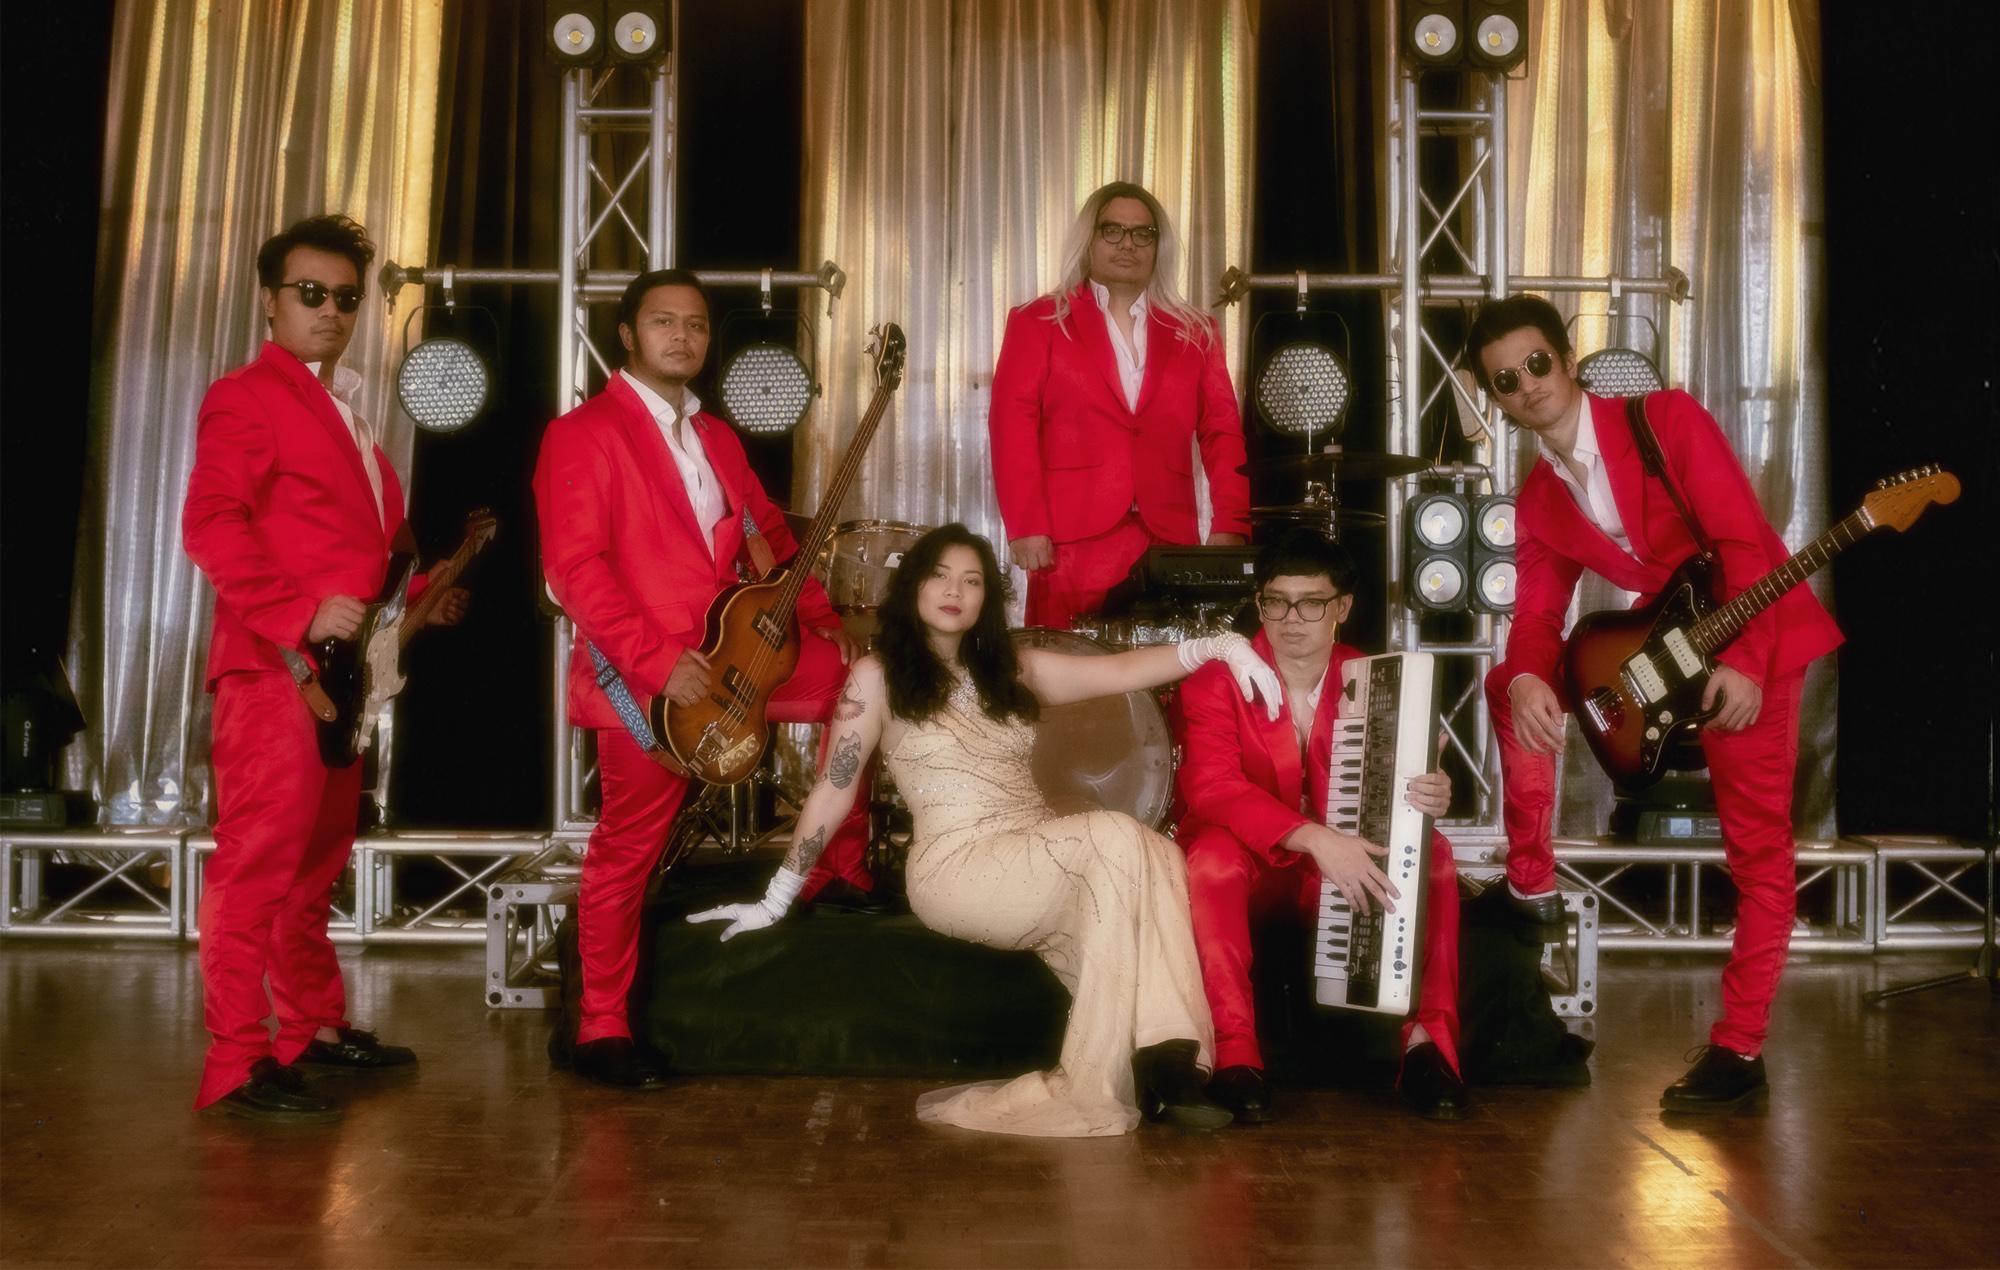 Danilla Riyadi and the Glamors album Peluh, Gairah & Kelana disco 2021